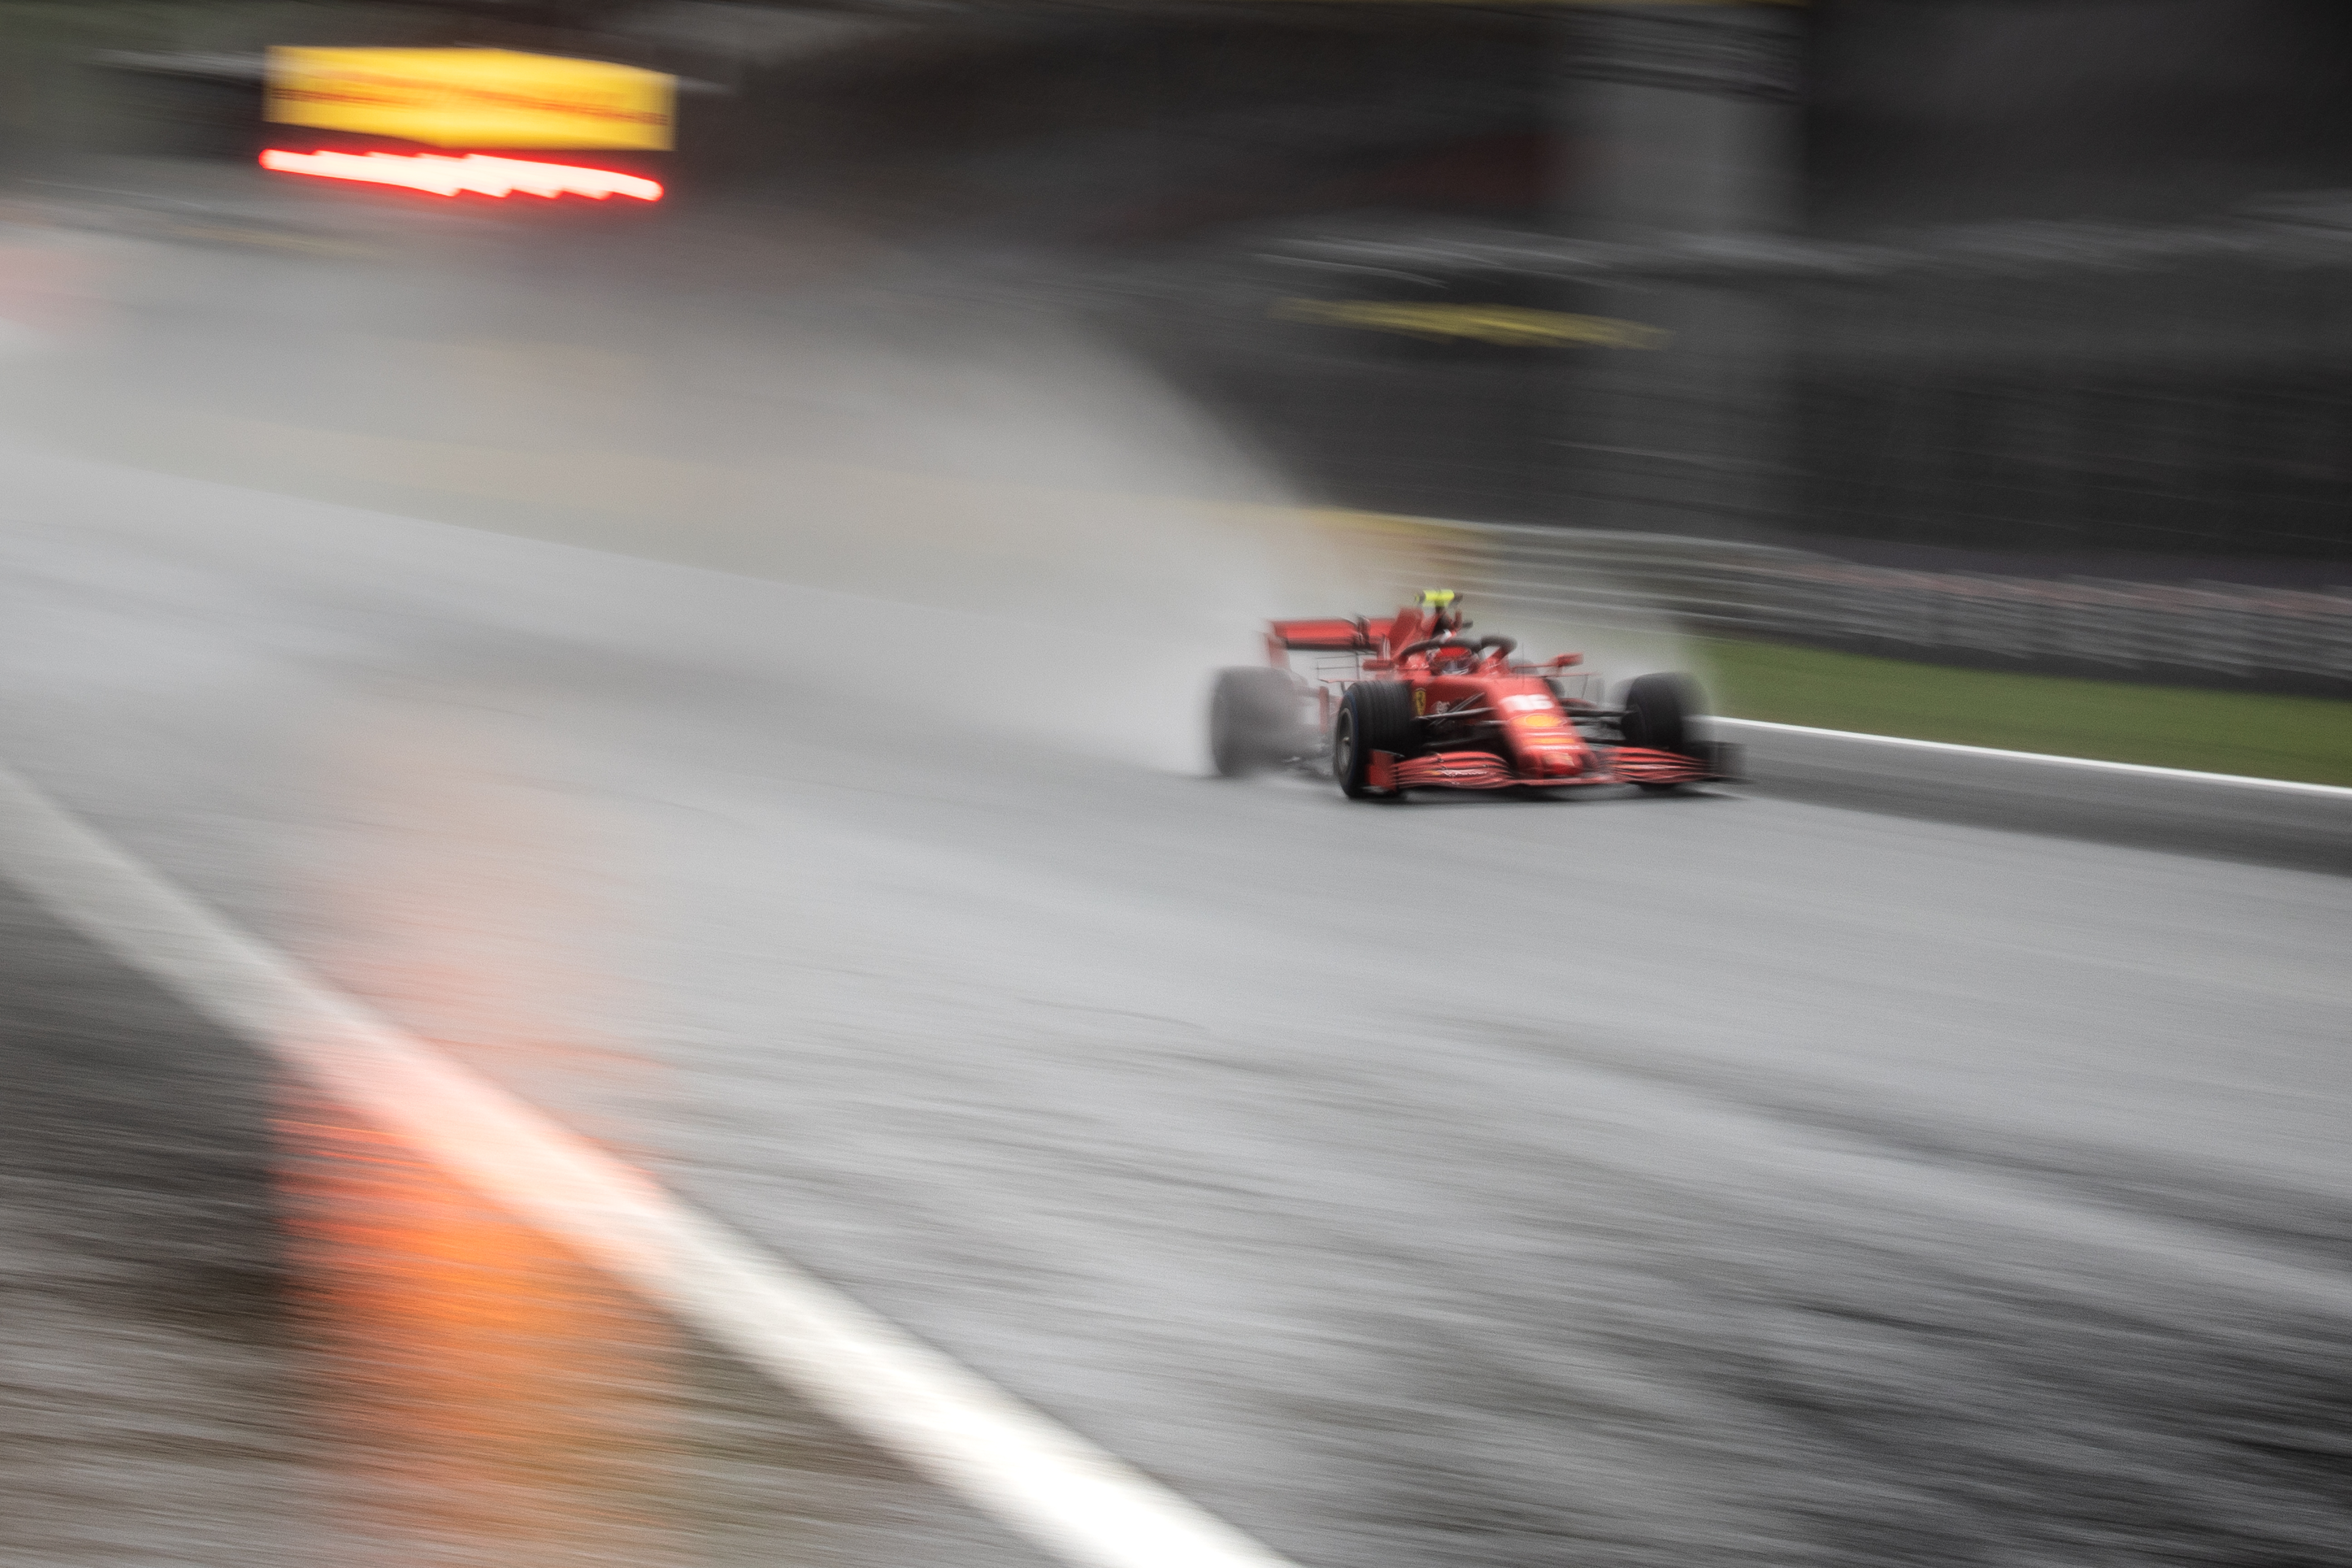 Charles Leclerc Ferrari Styrian Grand Prix 2020